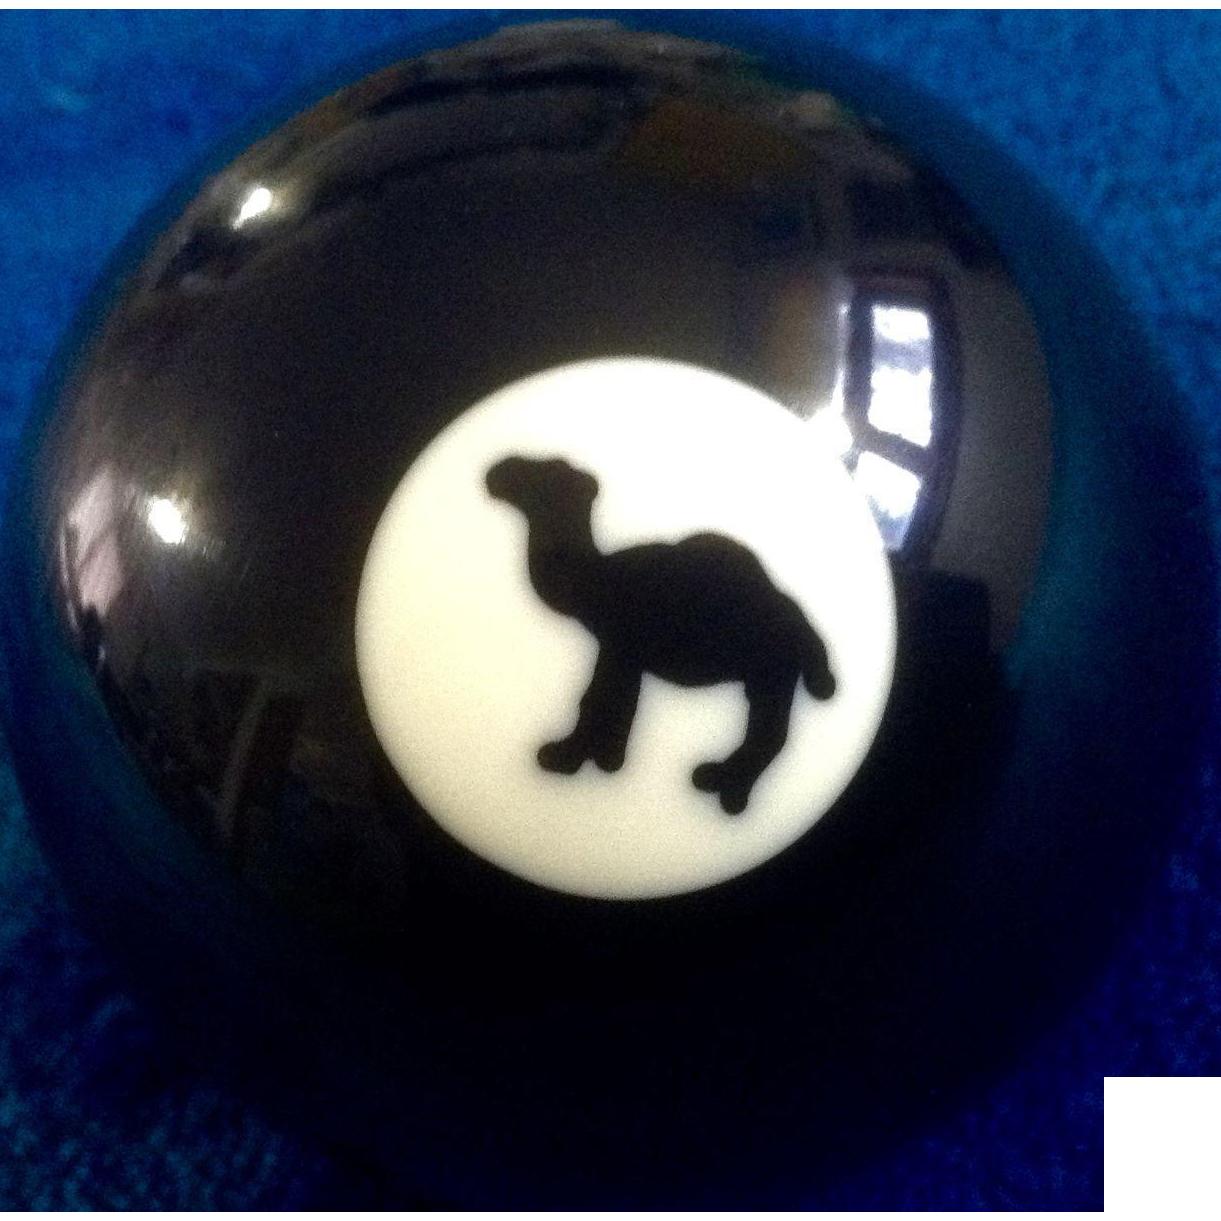 # 8 Joe Camel Cigarettes Black Billiard Pool Table Ball